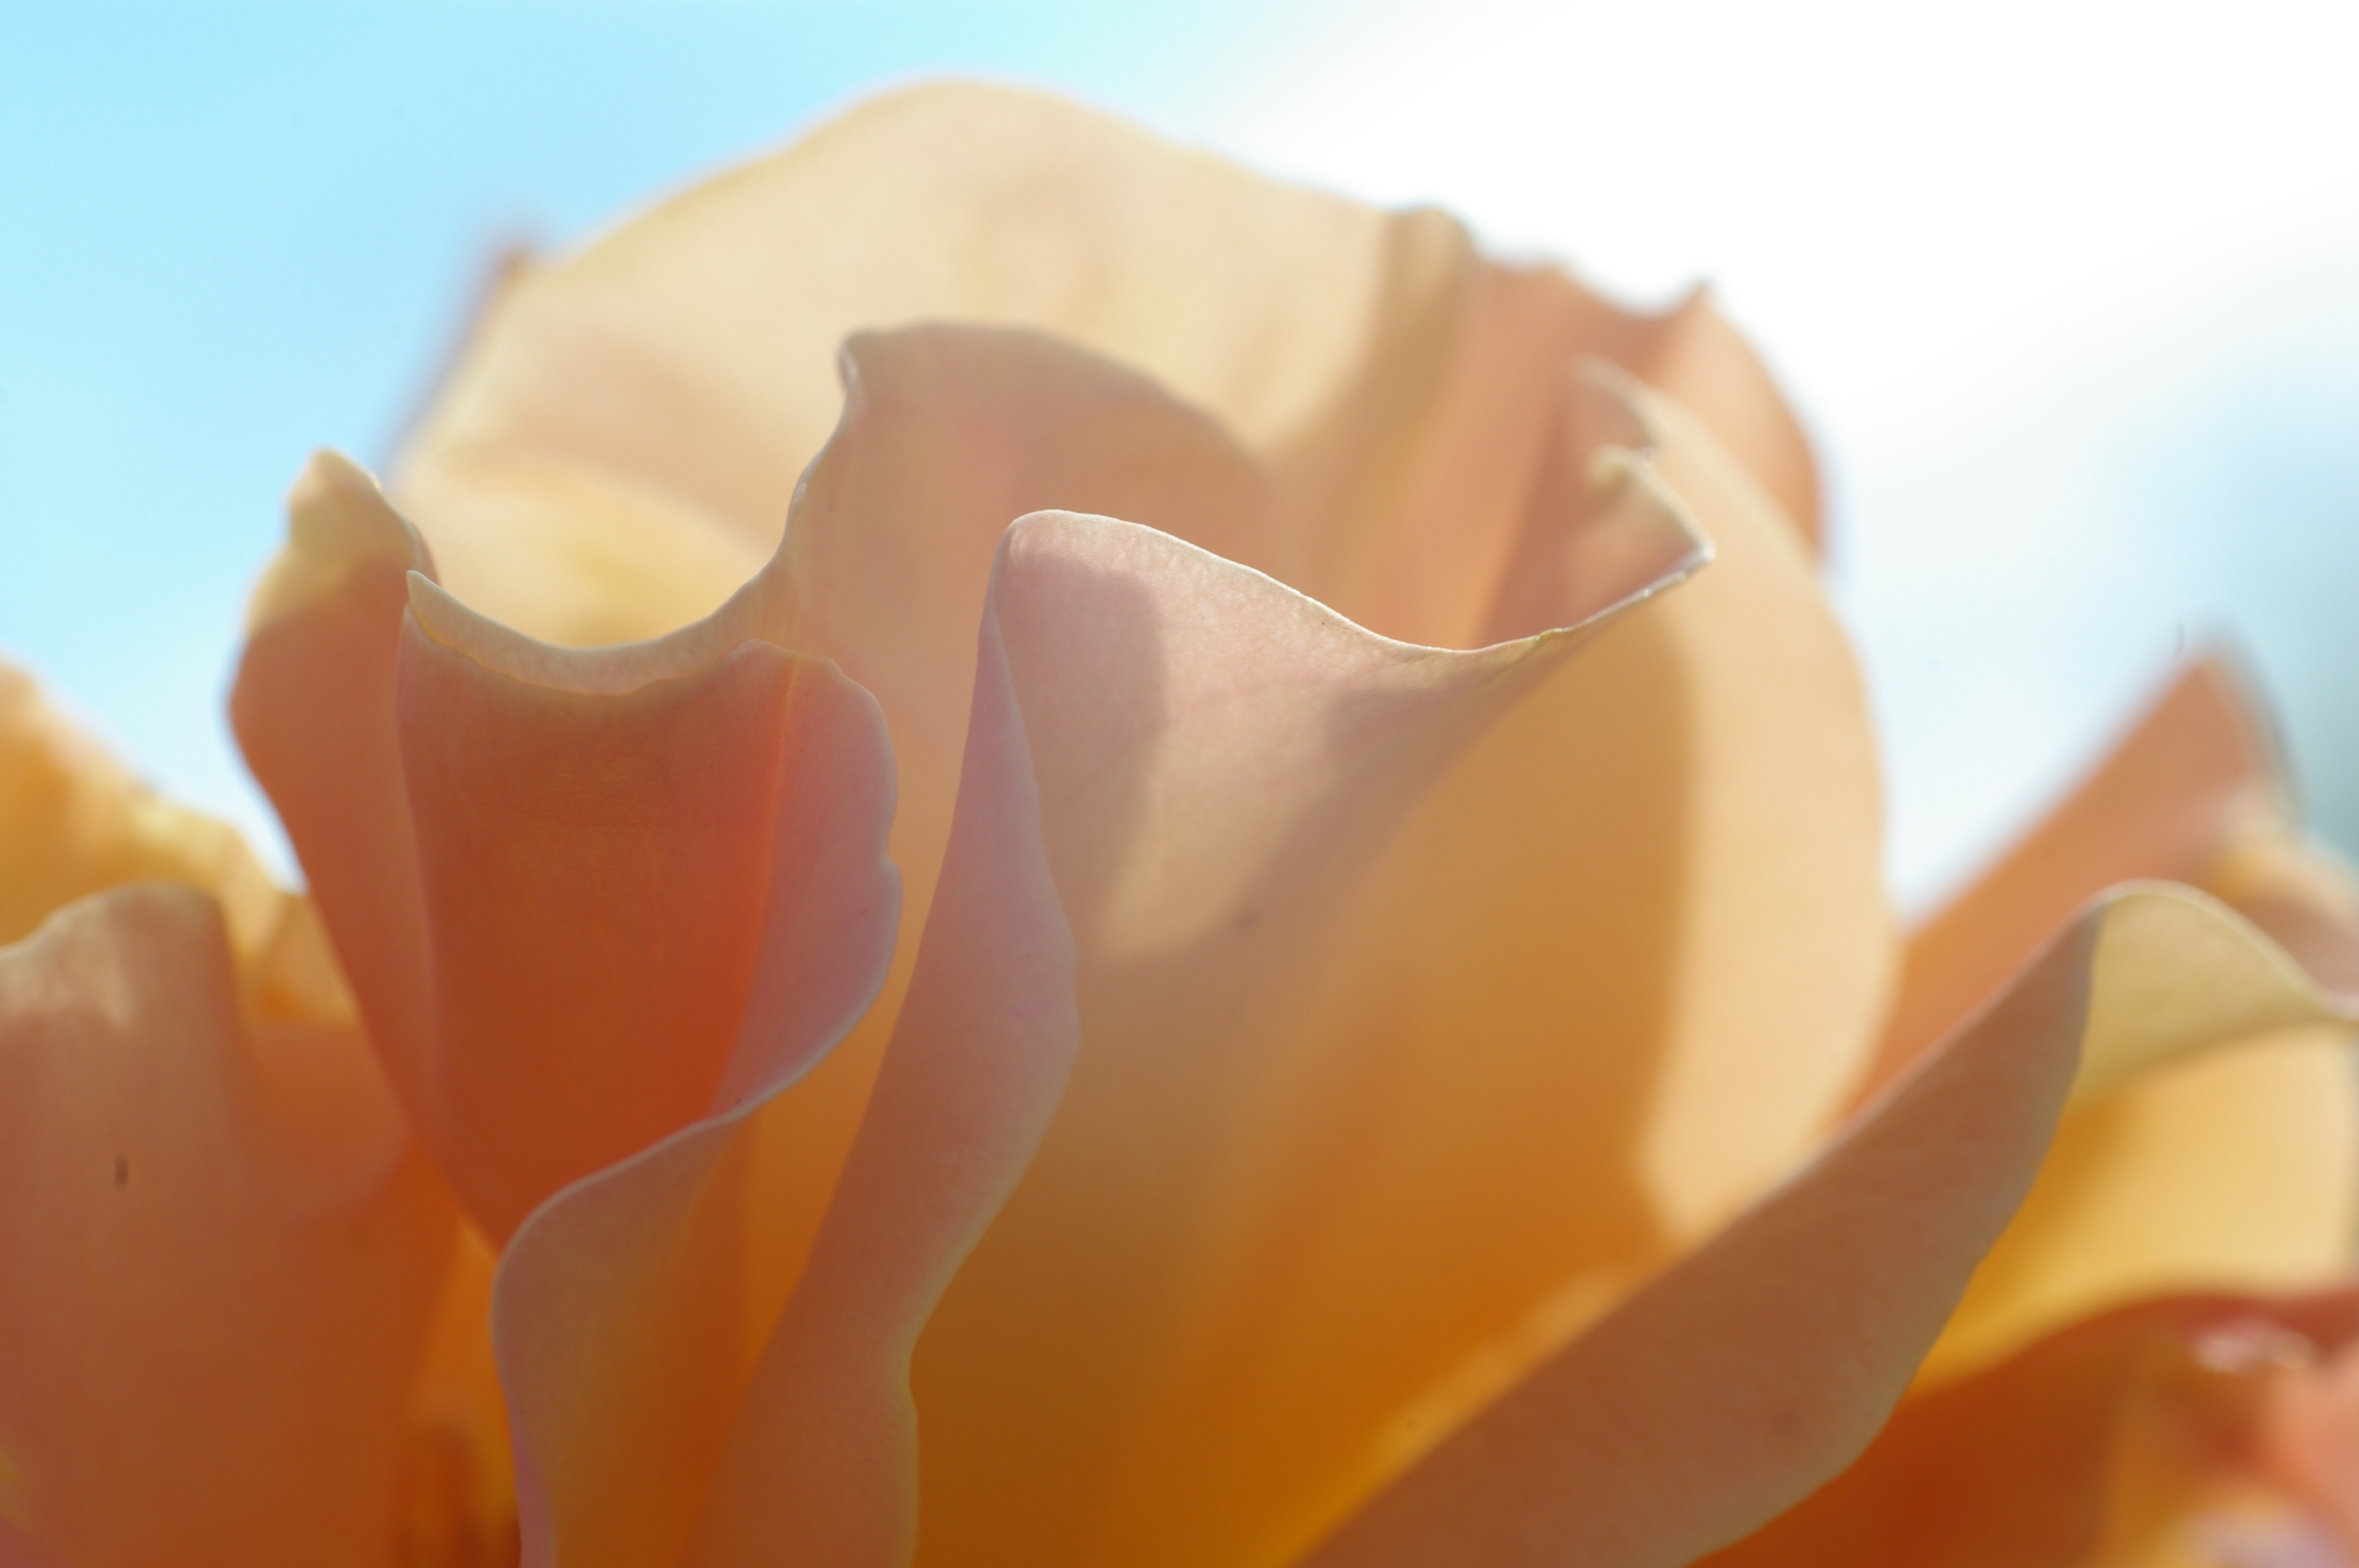 Rose, HQ Photo